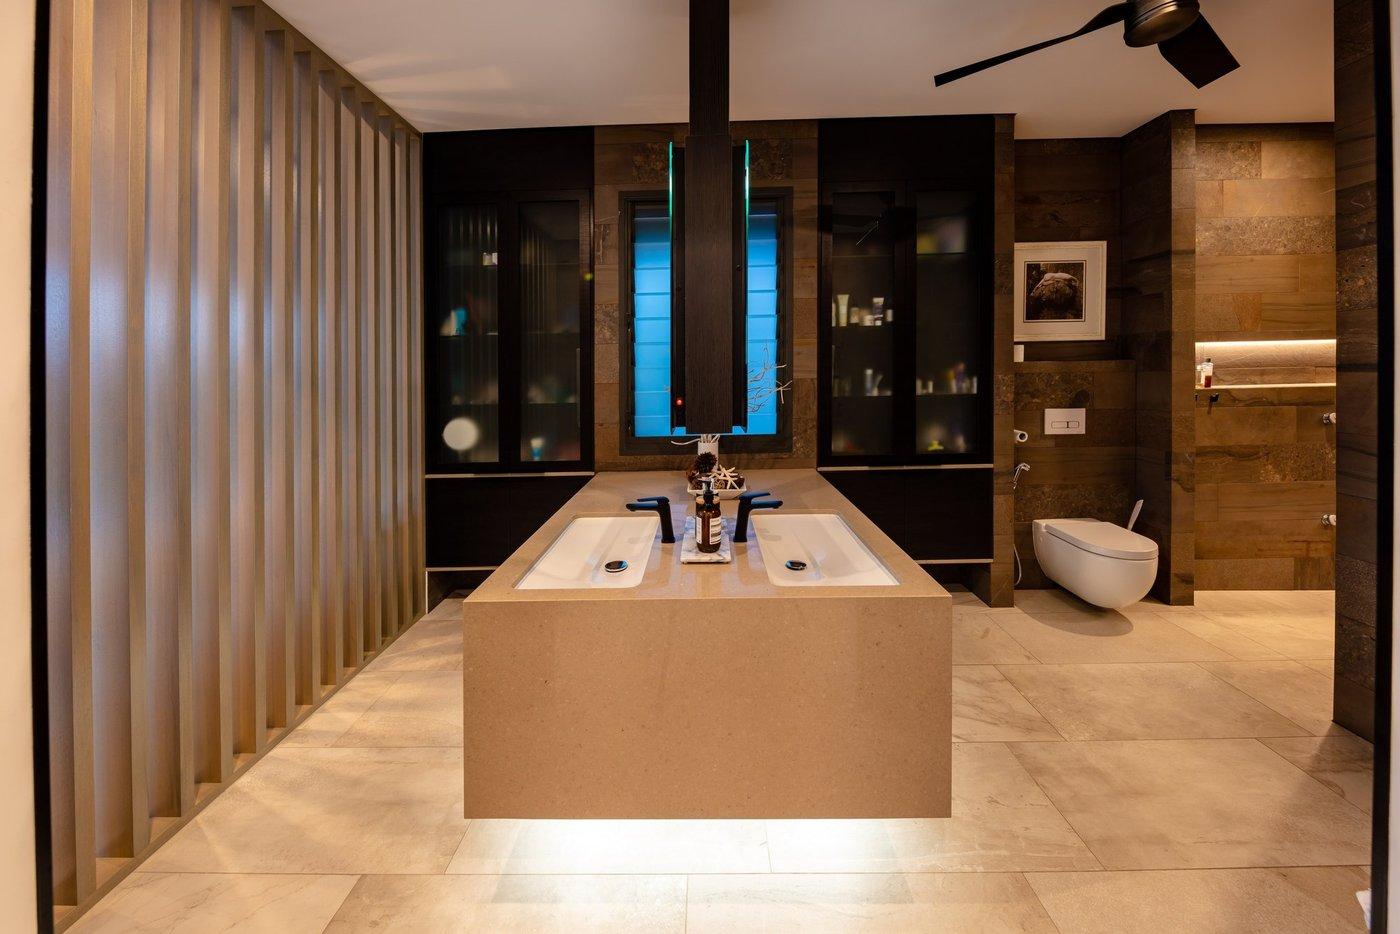 Custom designed bathroom with floating vanity